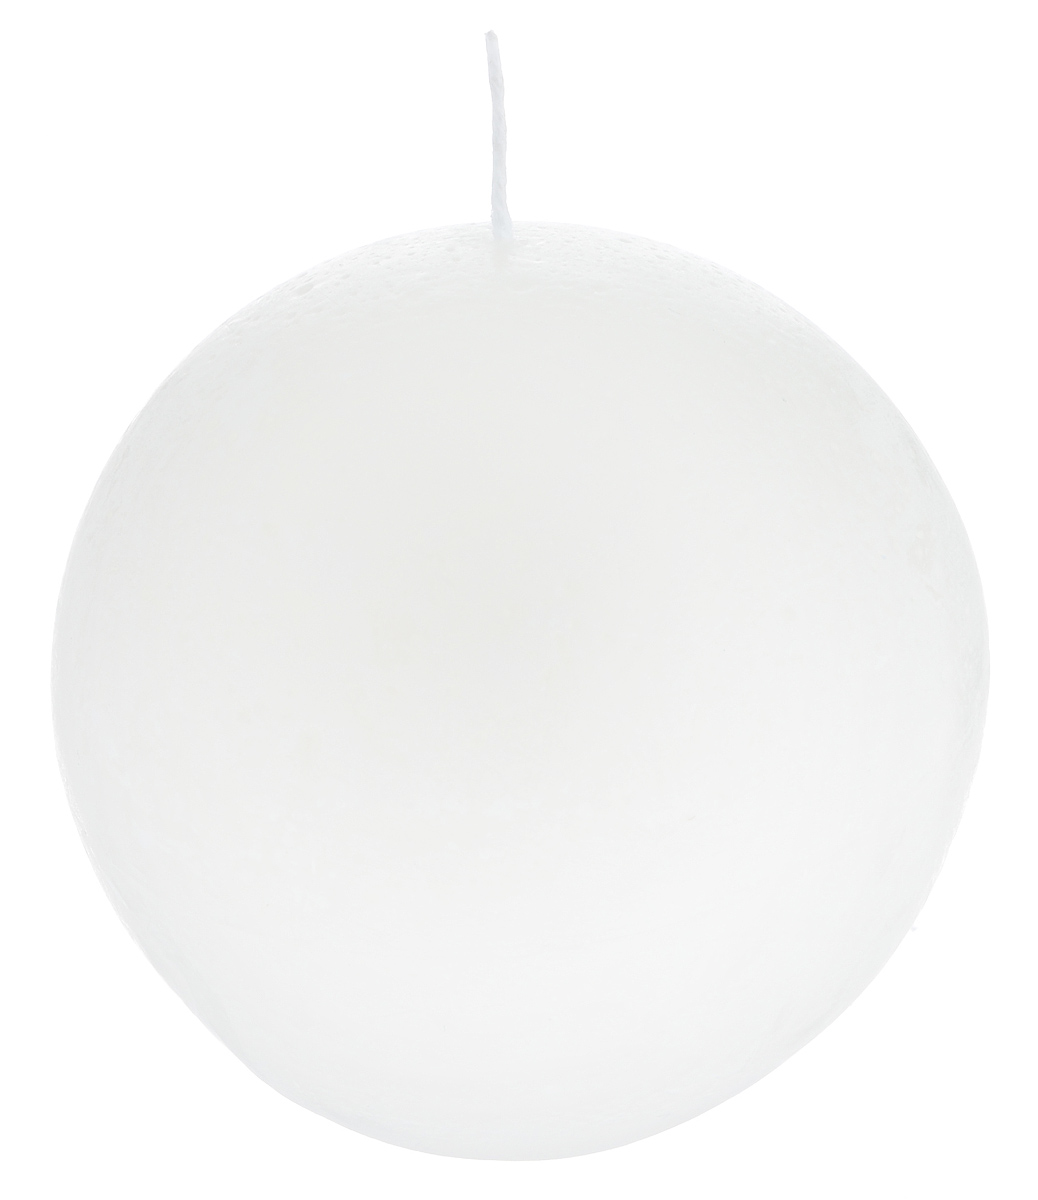 Свеча декоративная Proffi Шар, цвет: белый, диаметр 7,5 см proffi films pfm021